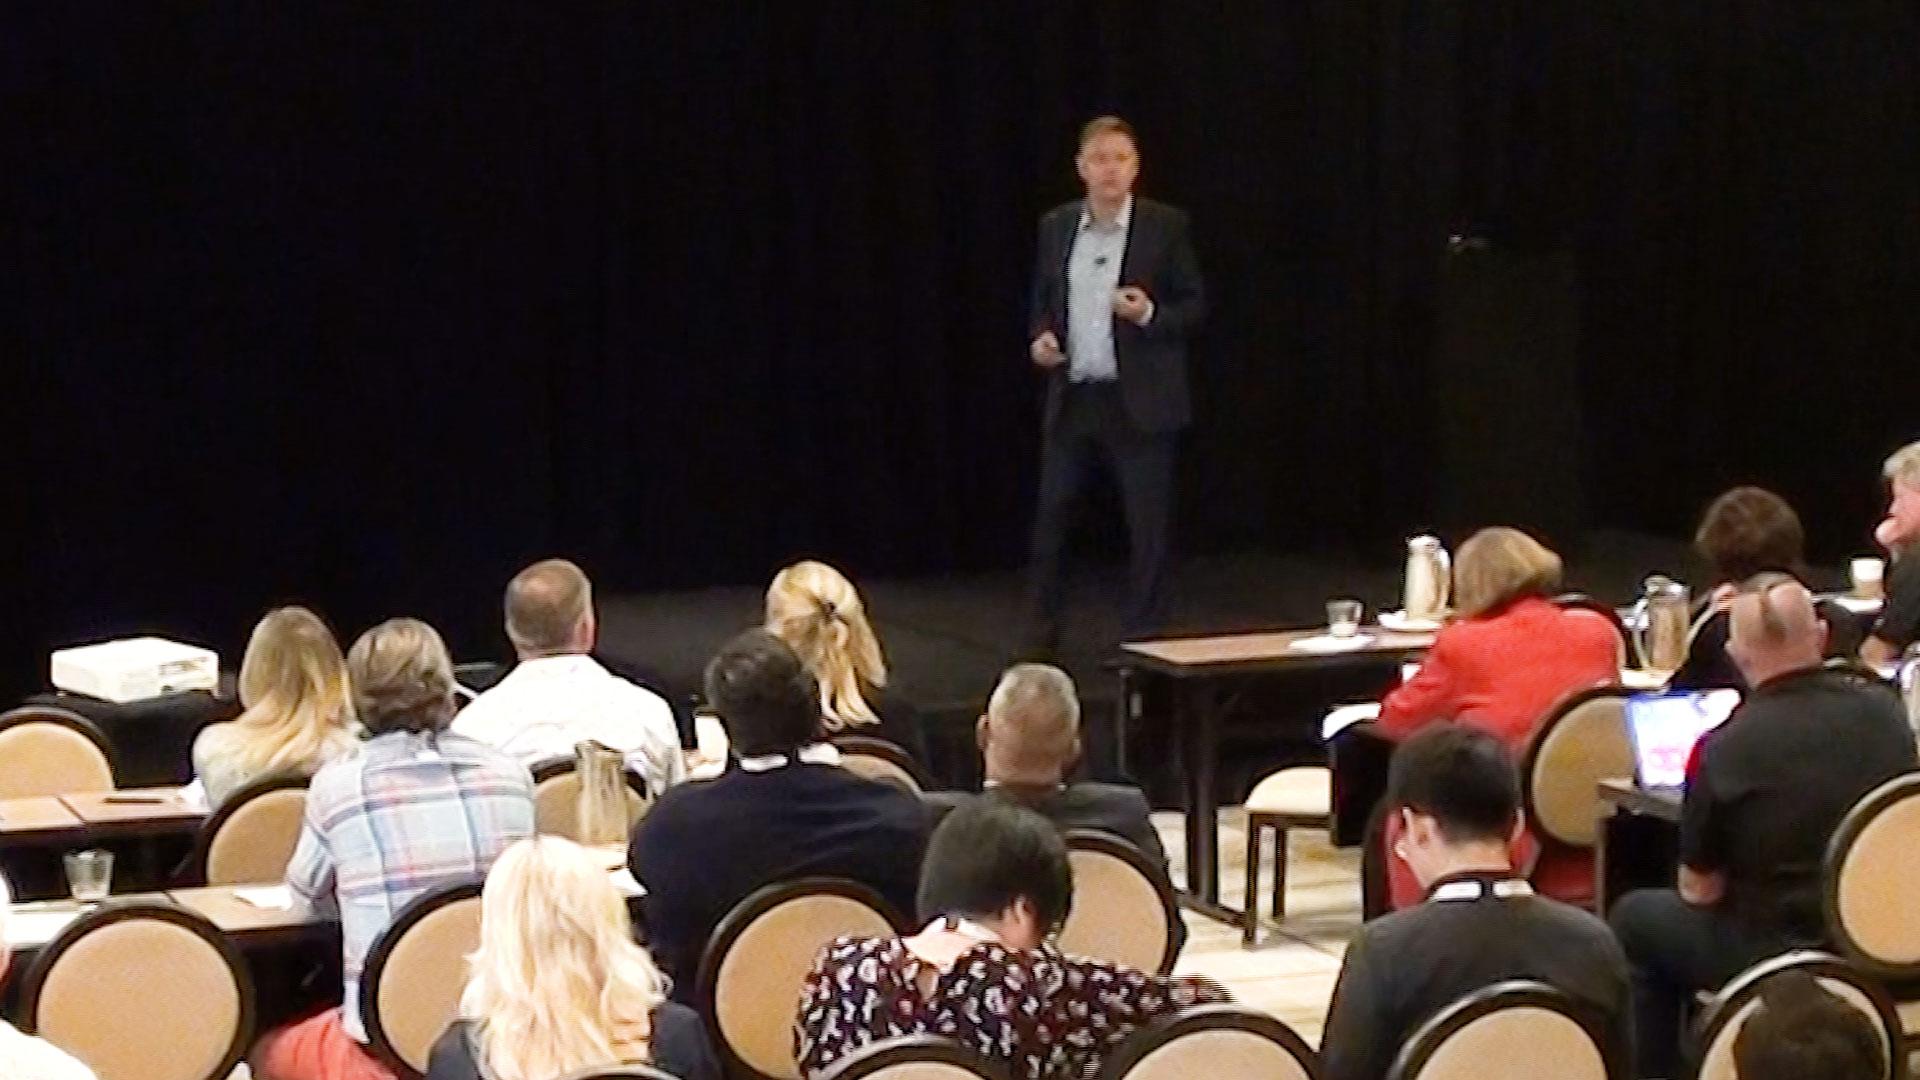 Keynote_Speaker_Jens-Uwe_Meyer_Napa_California